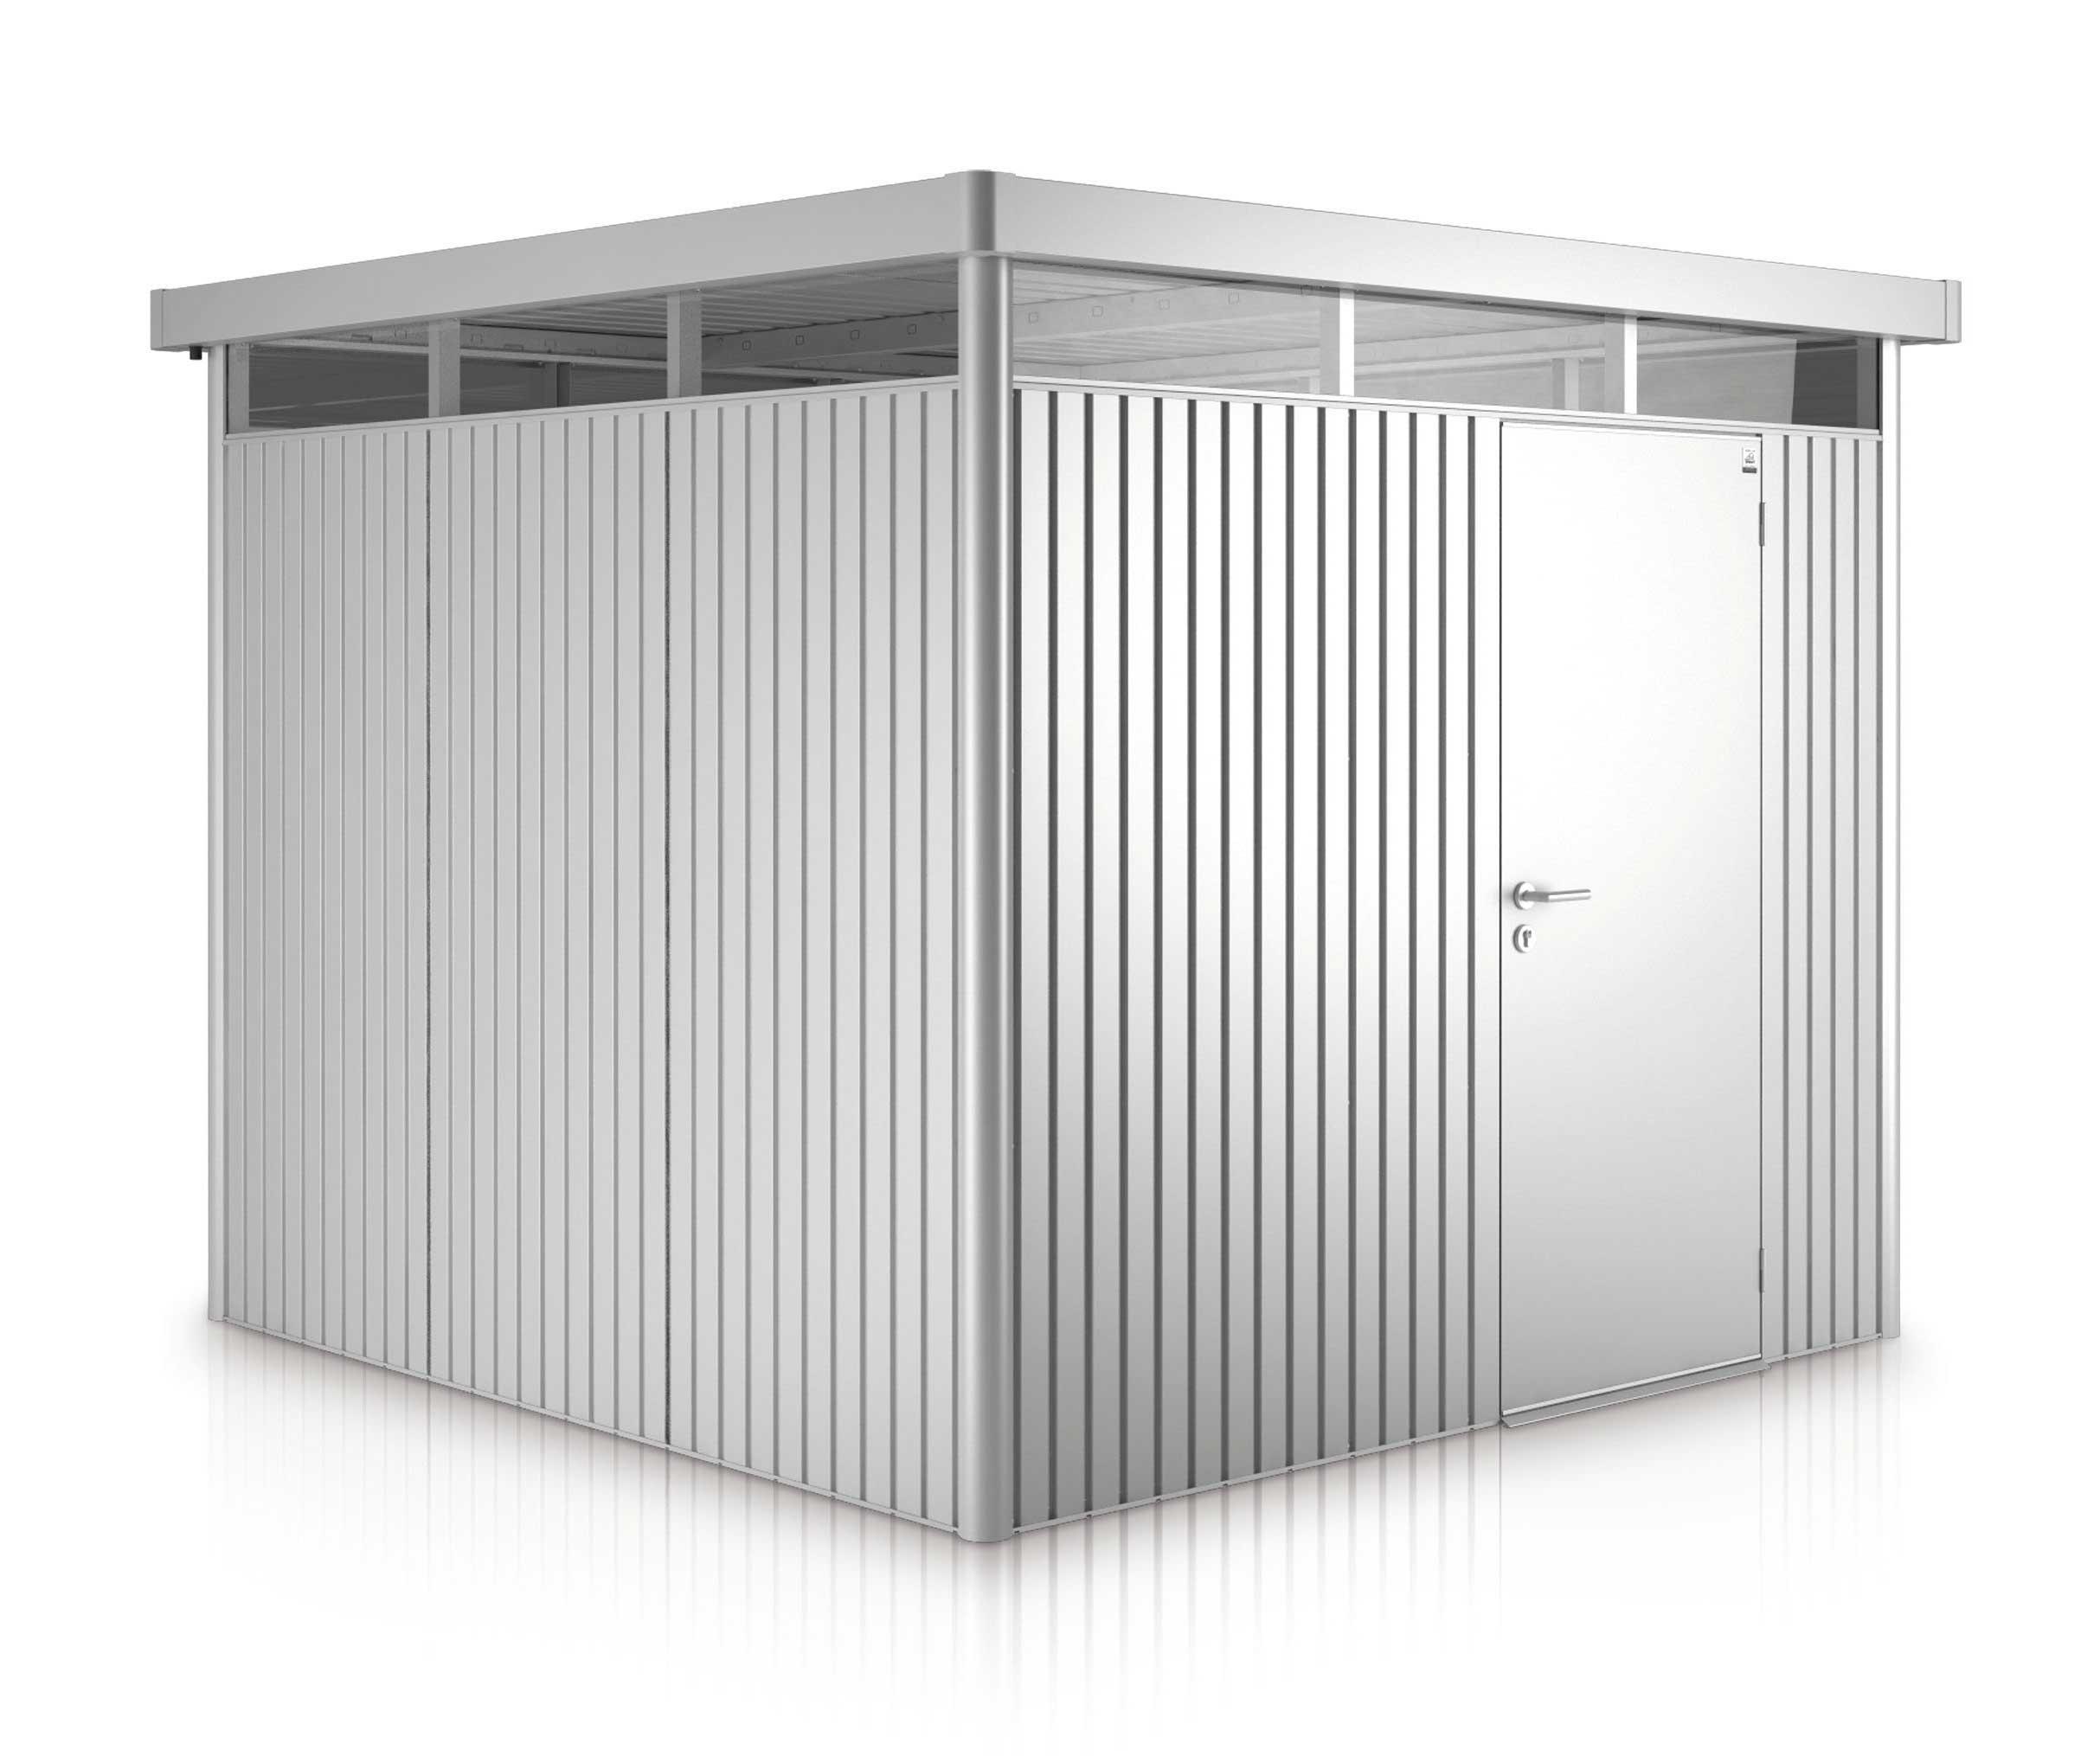 Gerätehaus Biohort HighLine H4 silber-metallic 275x275cm Bild 1